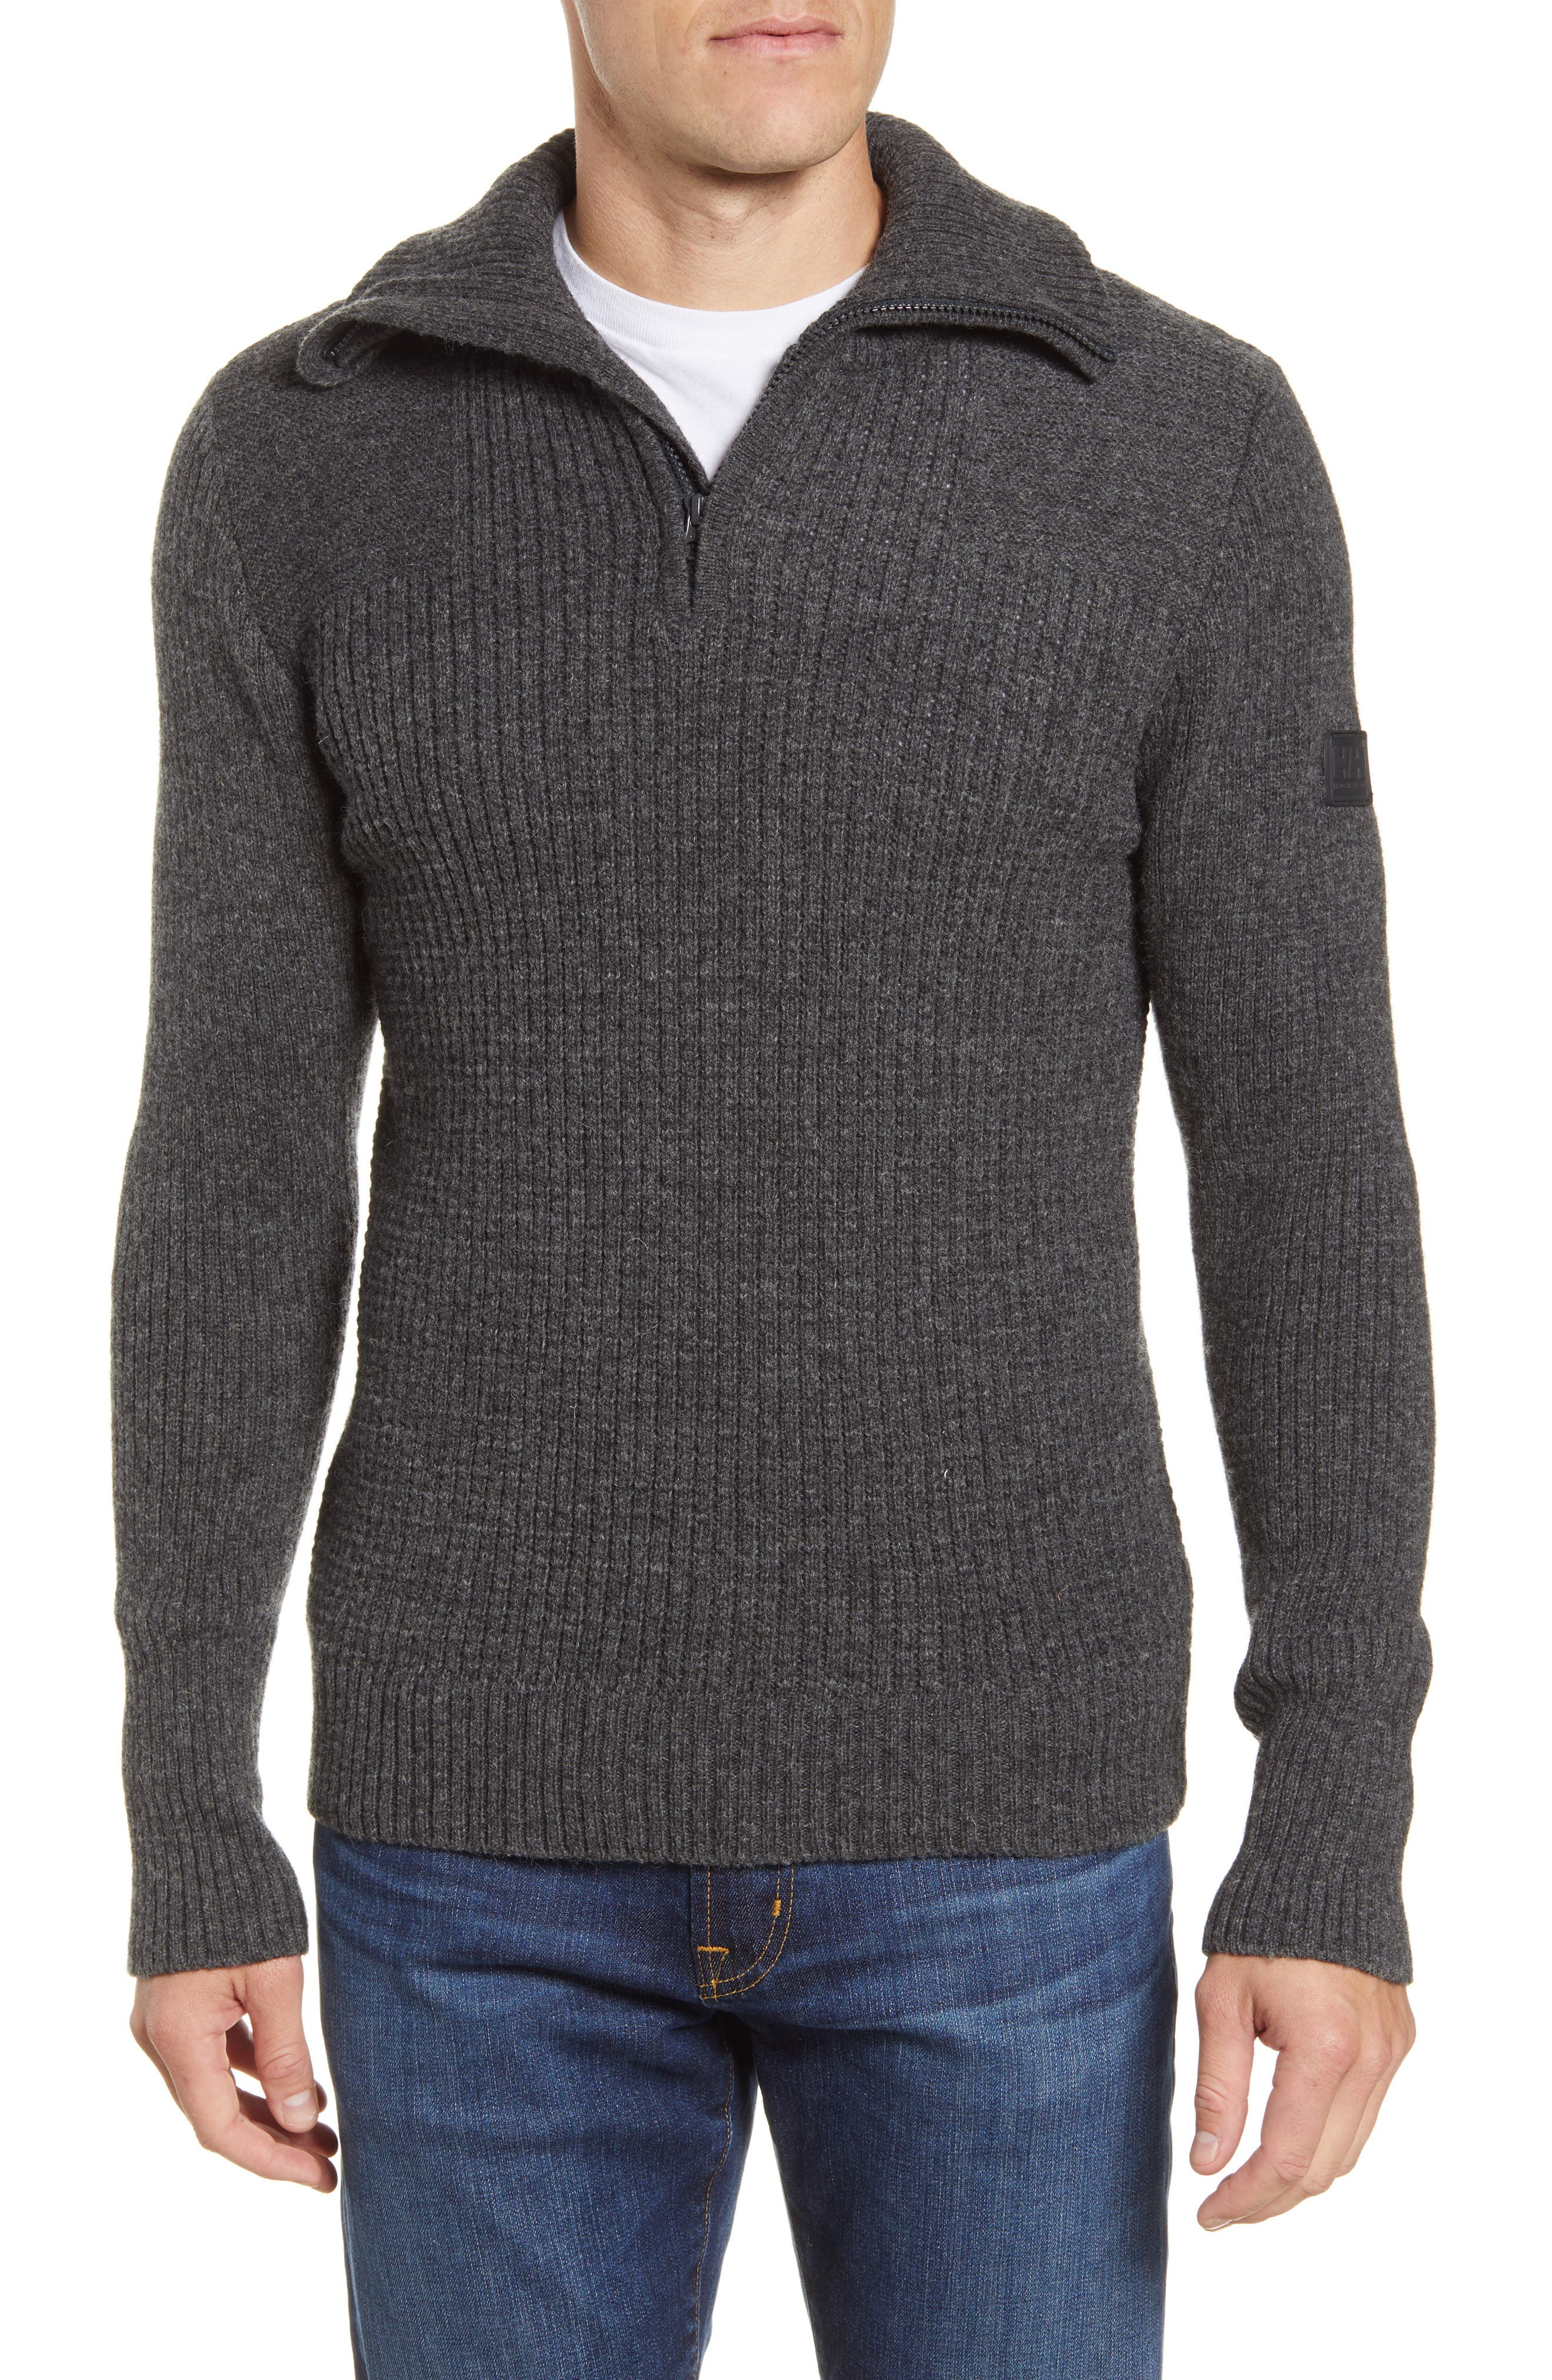 Marka Half Zip Wool Sweater